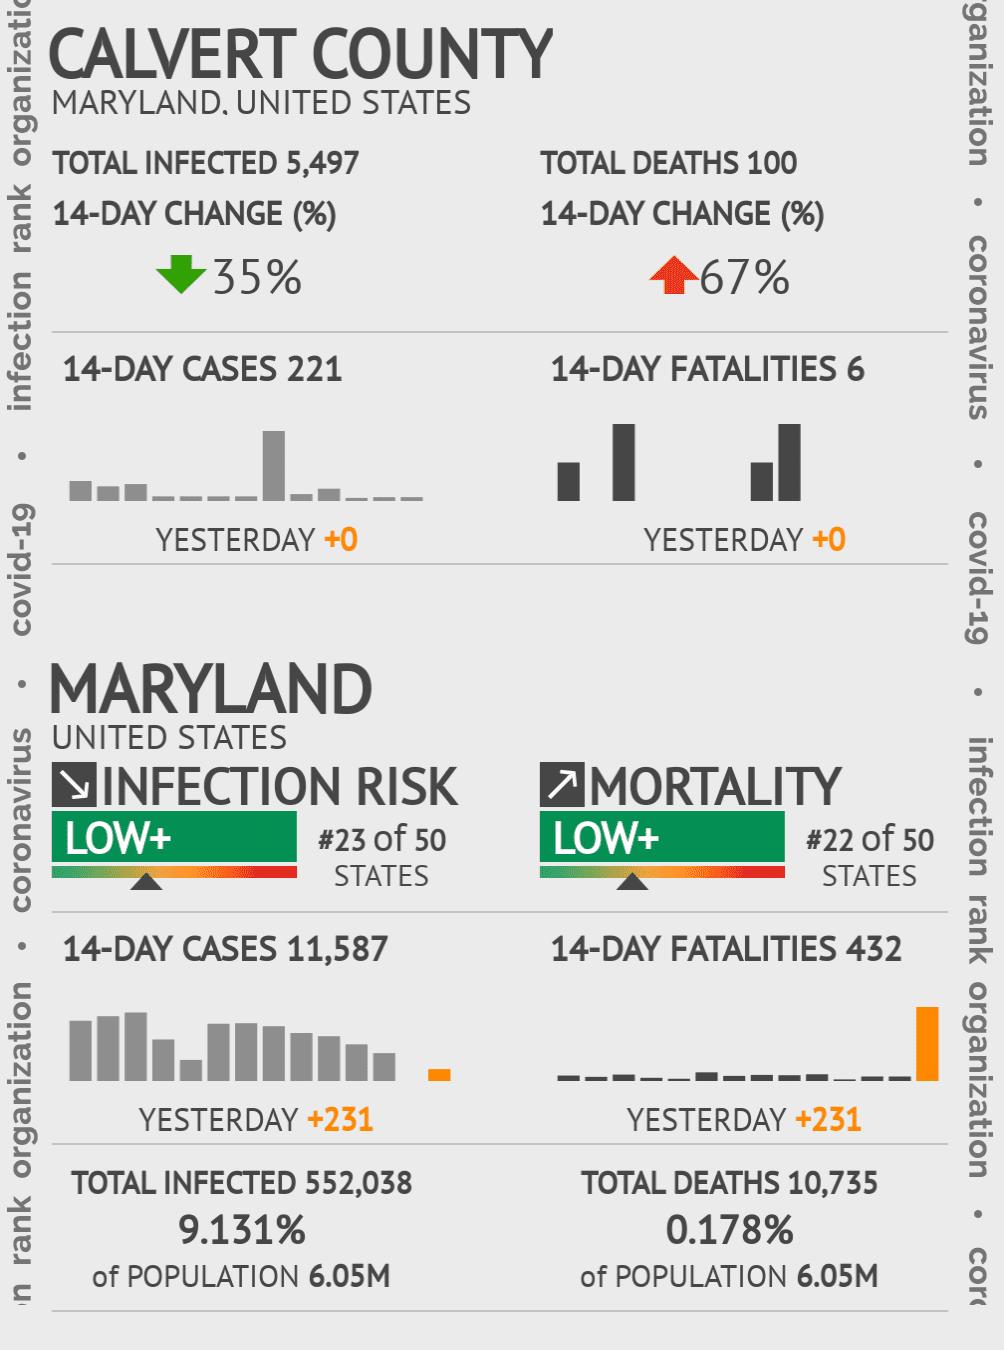 Calvert County Coronavirus Covid-19 Risk of Infection on March 06, 2021